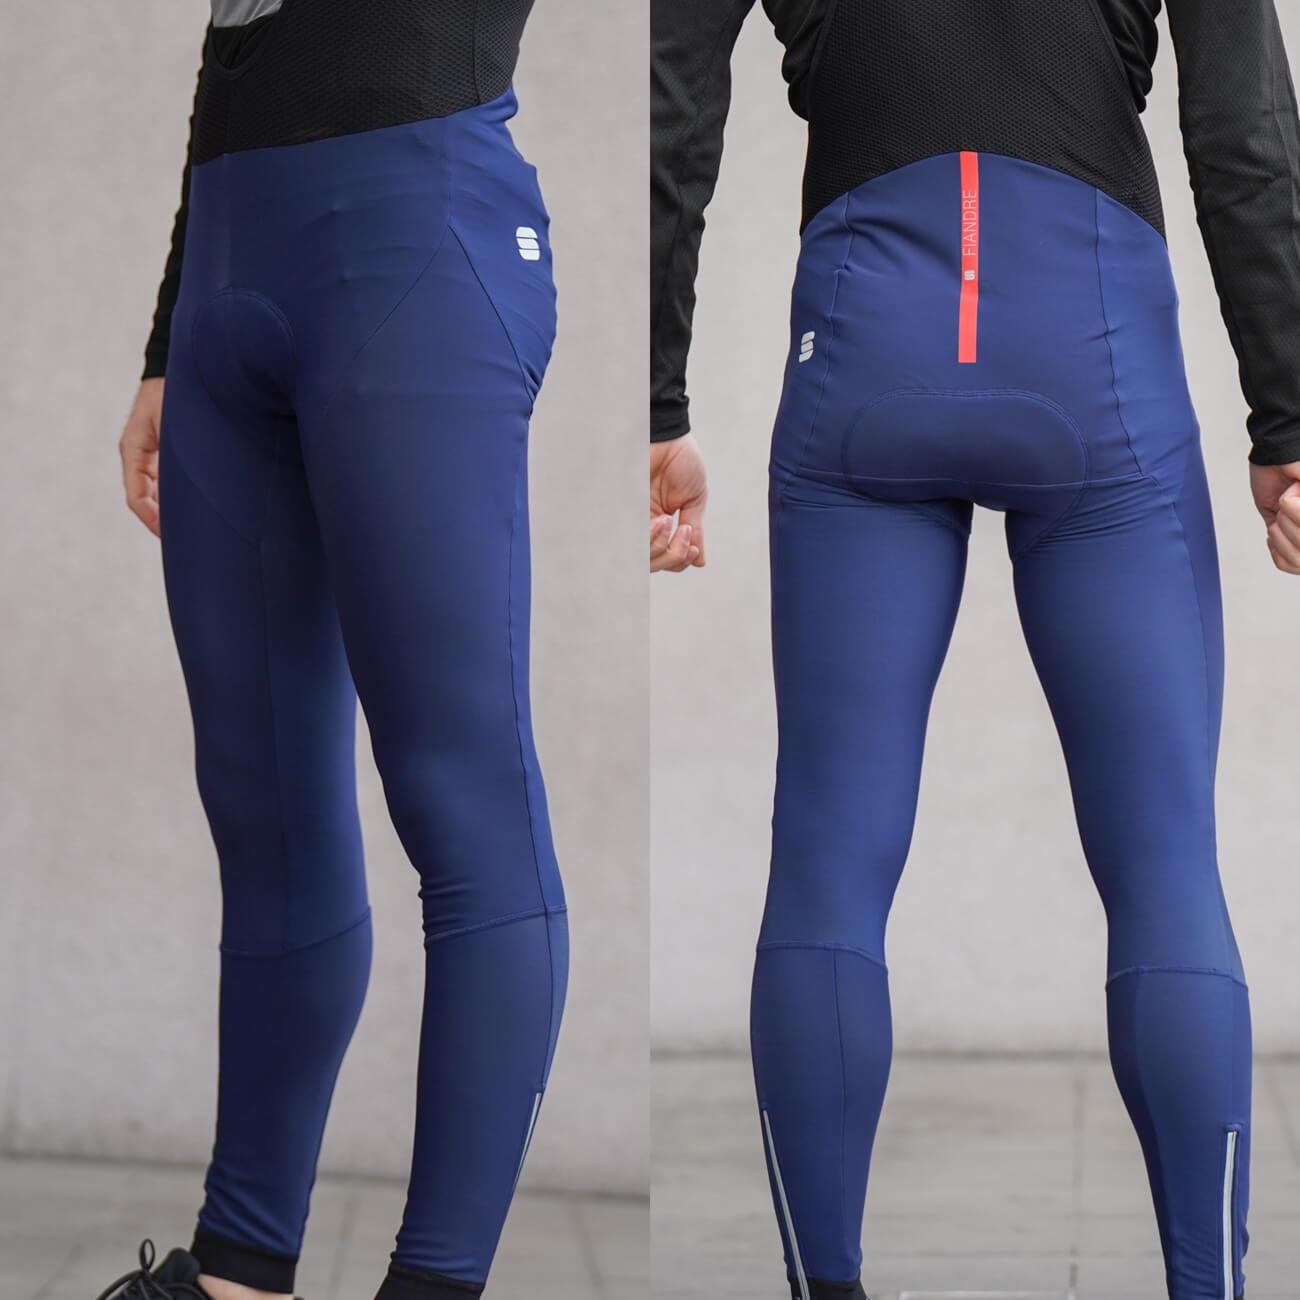 sportful-fiandre-norain-blue